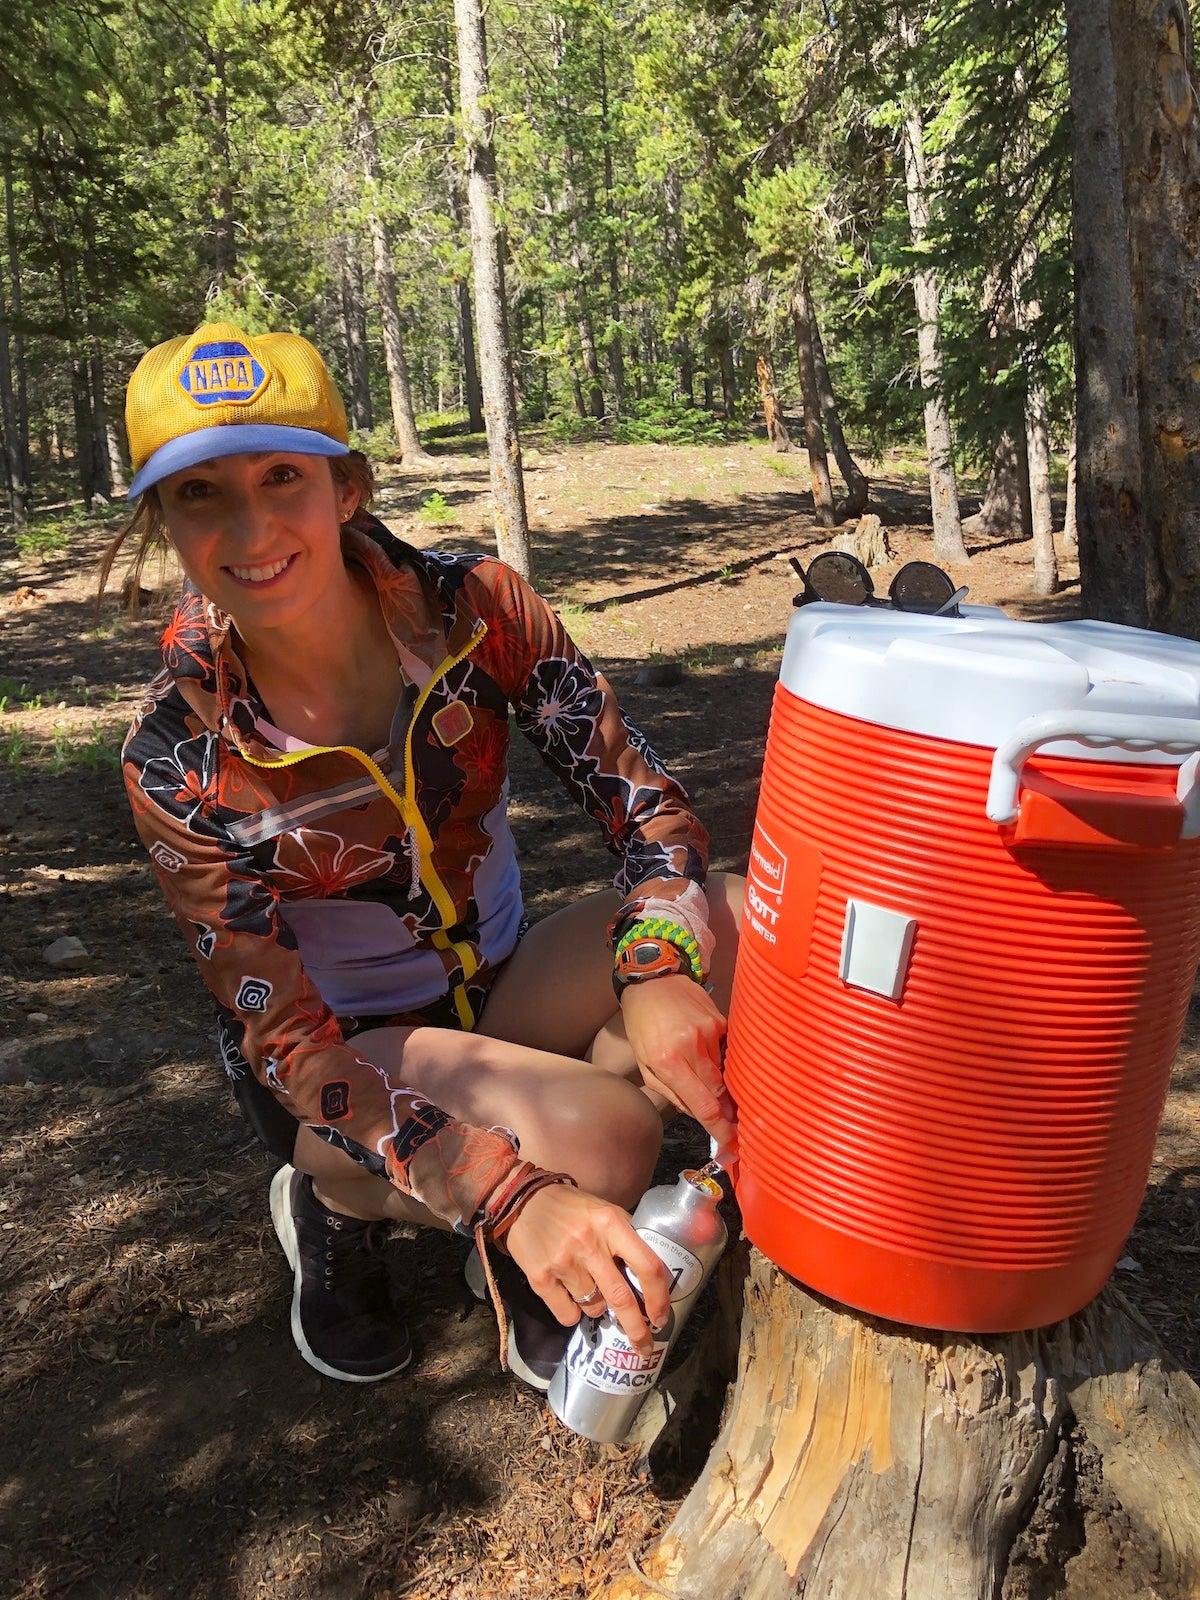 Sarah Vander Neut filling a water bottle